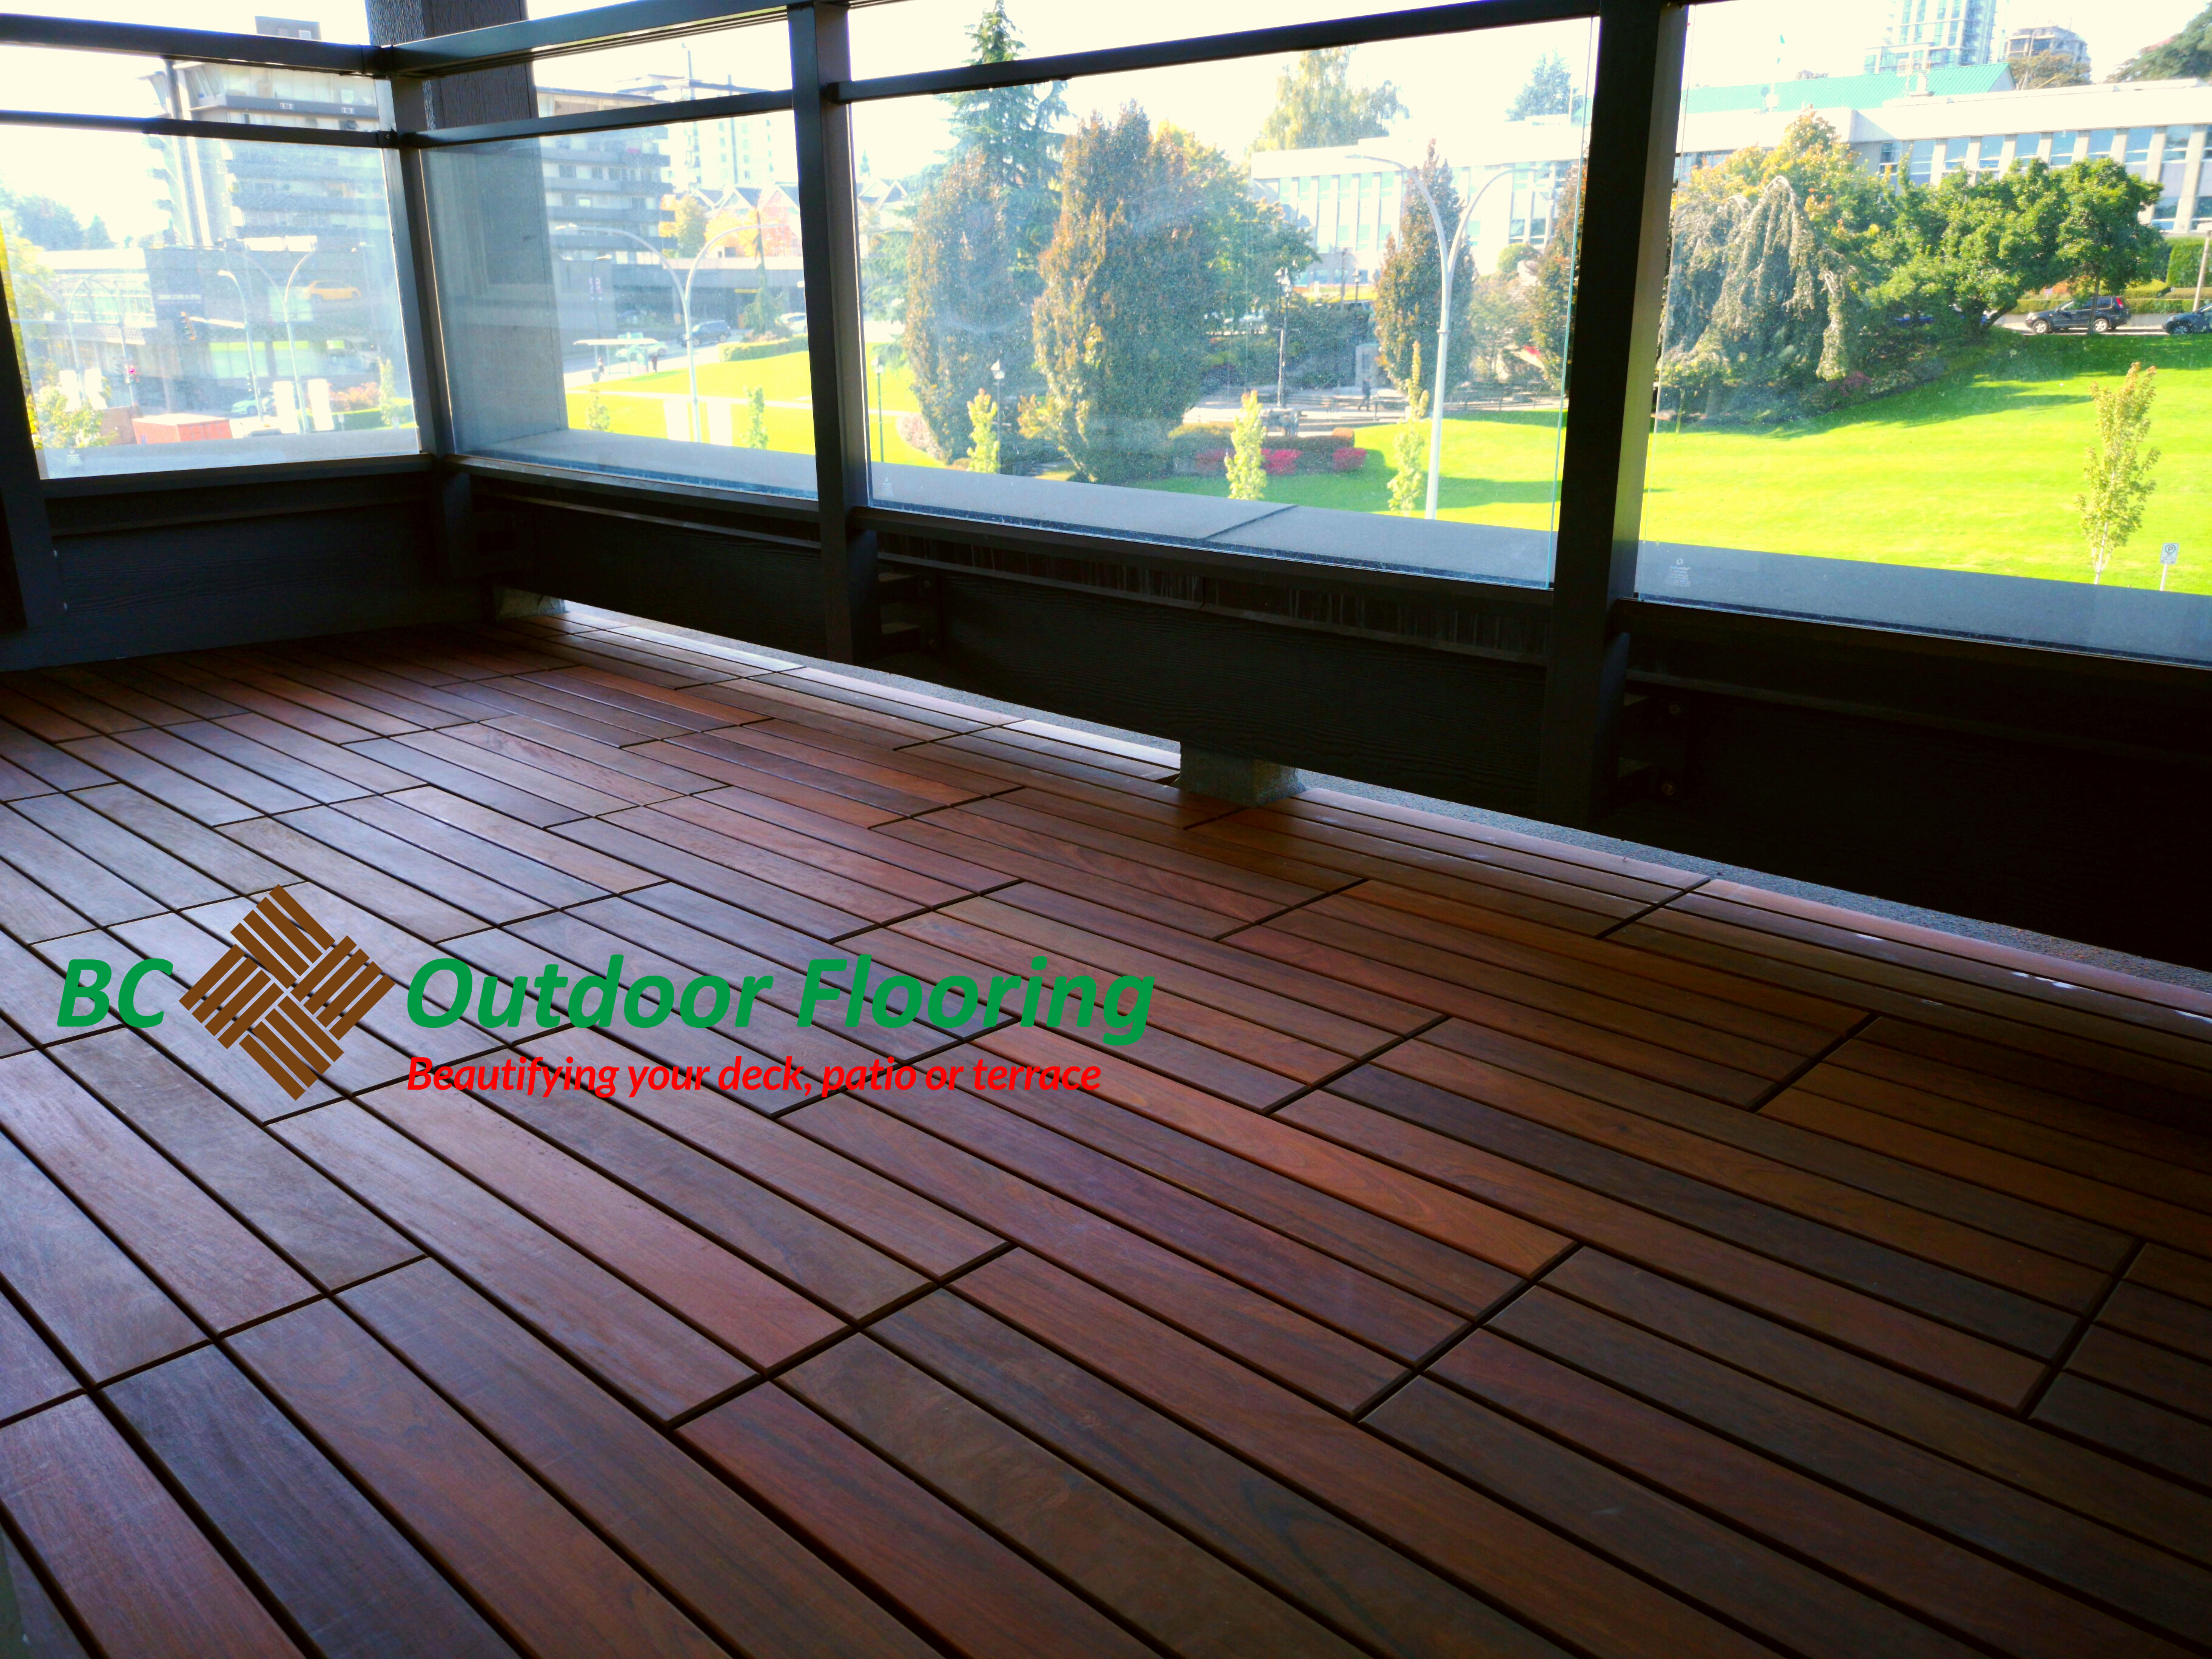 bc-outdoor-flooring-interlocking-ipe-wood-deck-tiles